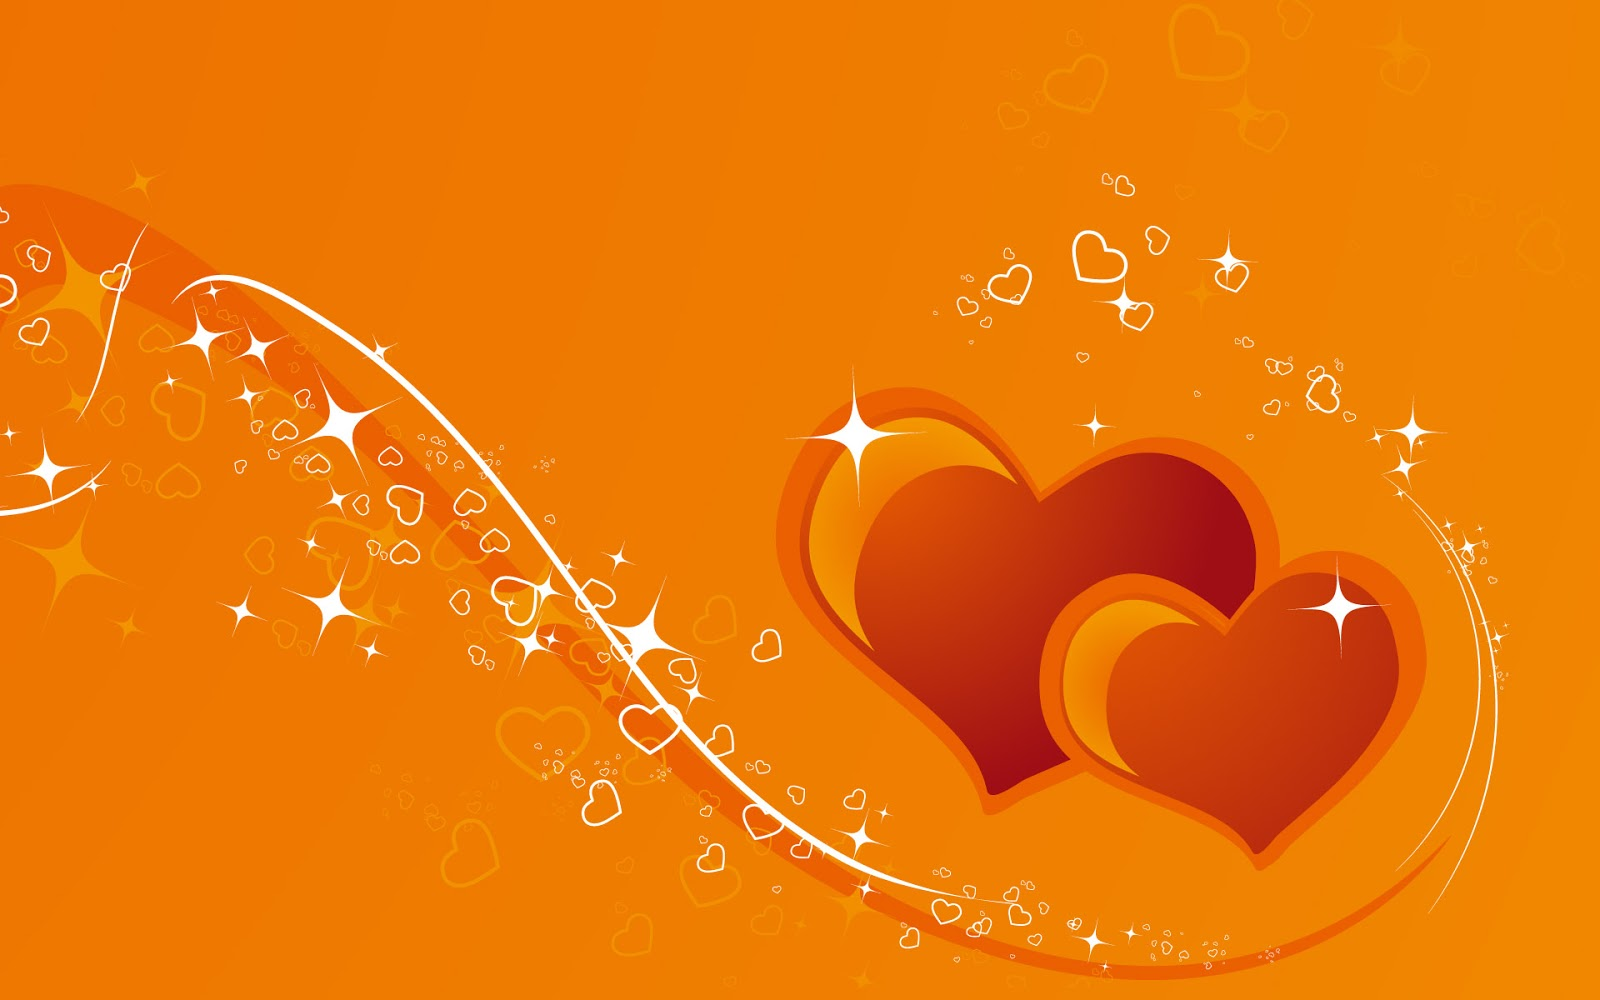 http://4.bp.blogspot.com/-8XPEf68HT_M/UPbEW0zVX1I/AAAAAAAACCc/Qj0QoLYEm-Y/s1600/valentines+day+decstop+backgrounds+(3).jpg